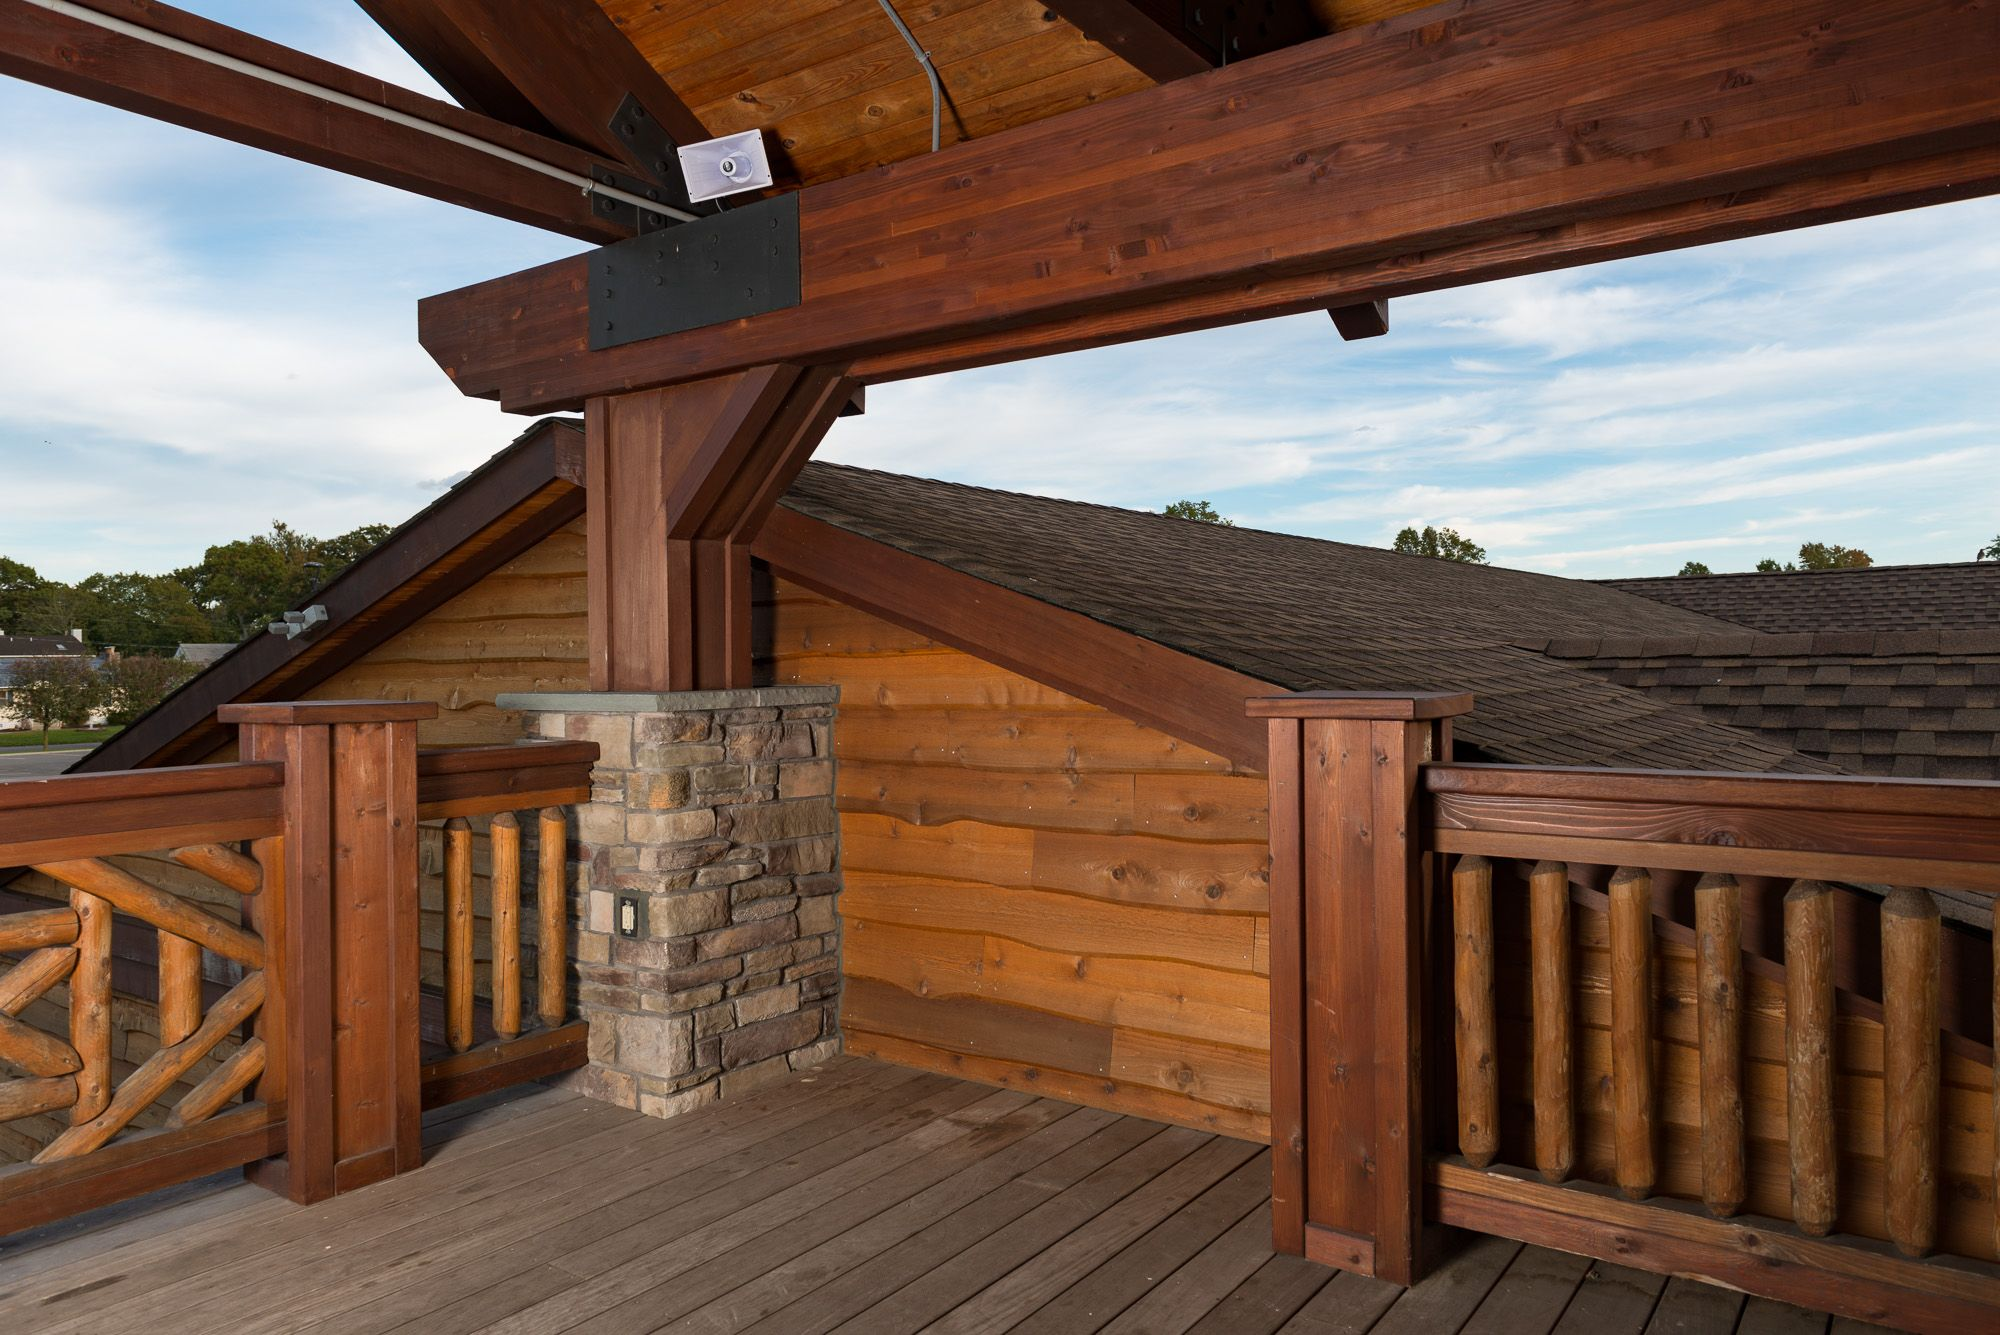 Park Center Wrapped In Our Wavy Edge Bevel Cedar Siding In 2020 Cedar Siding Patio Art Knotty Pine Paneling